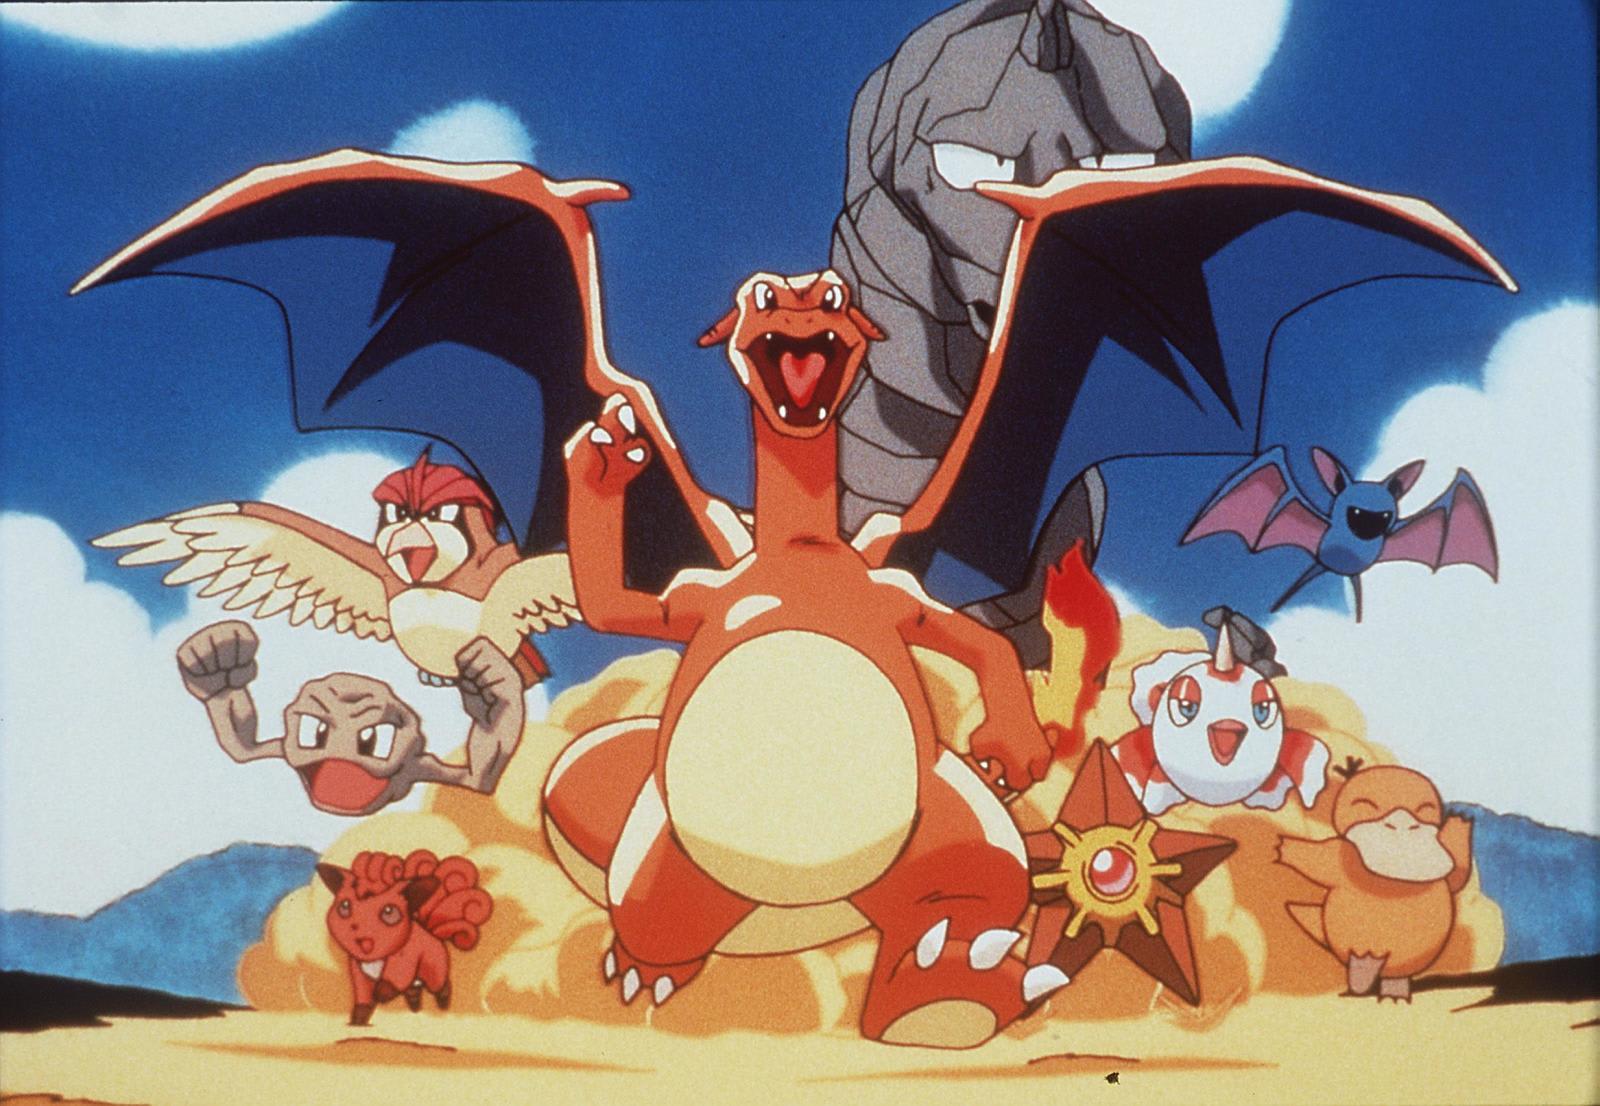 Pokemon The Series Ranking Ash Ketchum S Travel Companions